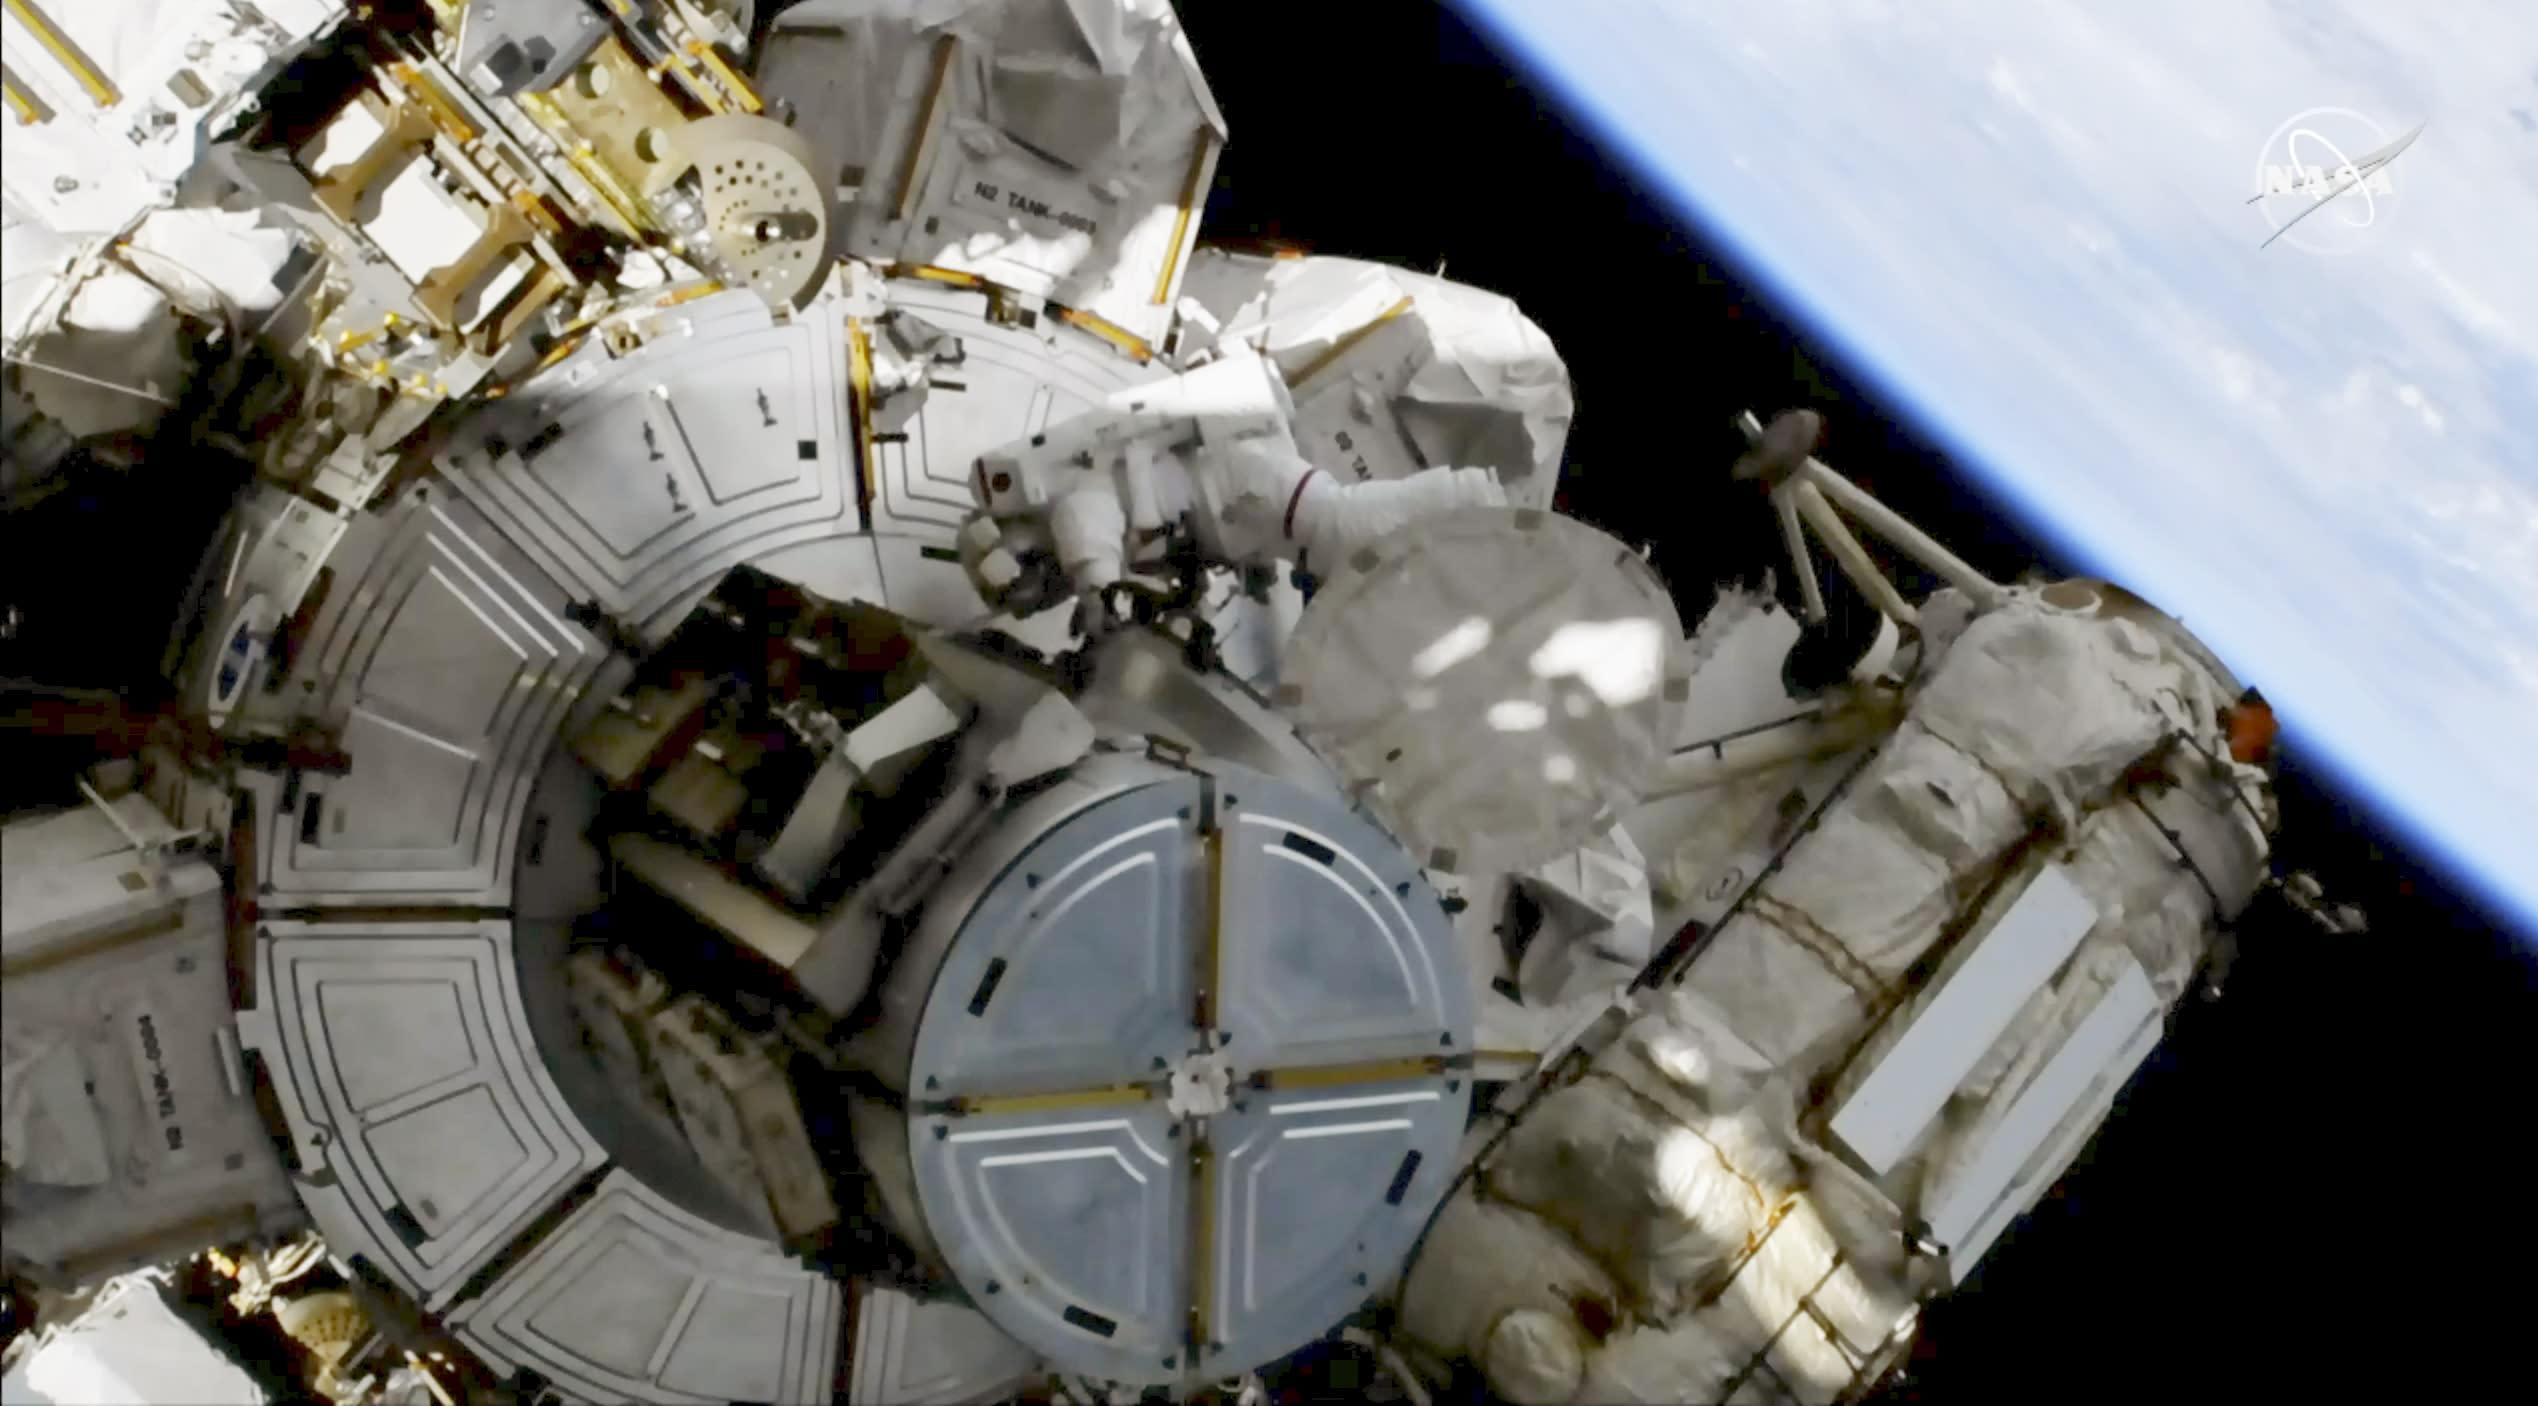 Russian Cosmonaut Alexei Leonov, First Human to Perform Spacewalk, Dies